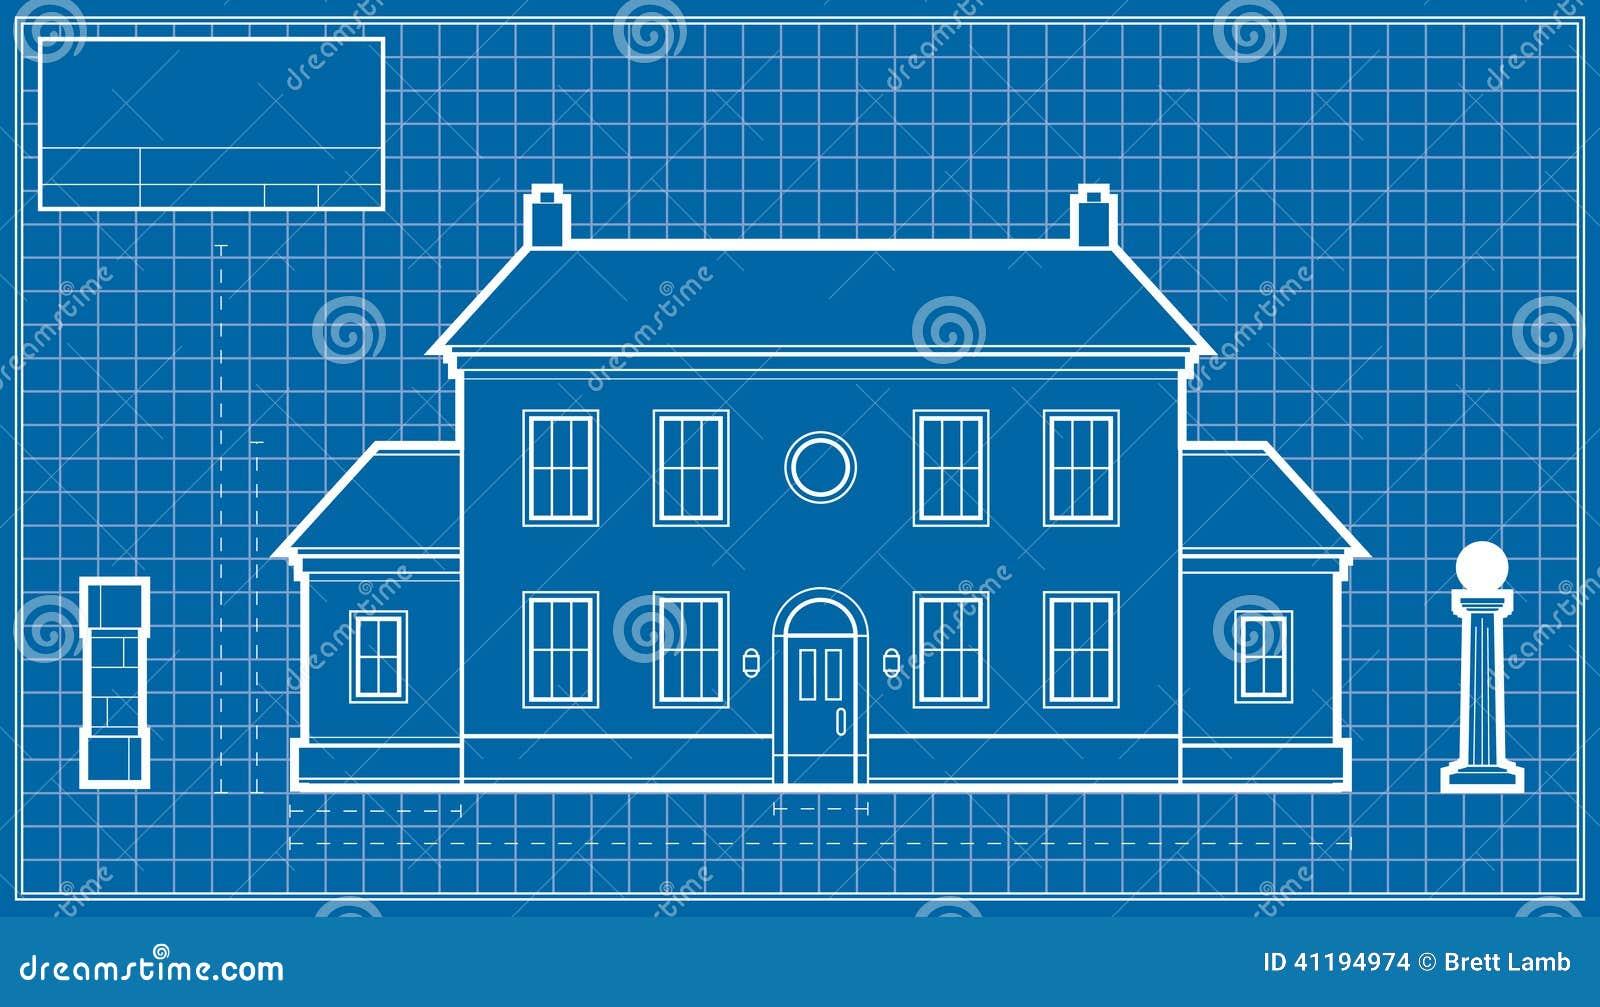 Diagram Of A Mansion - House Wiring Diagram Symbols •